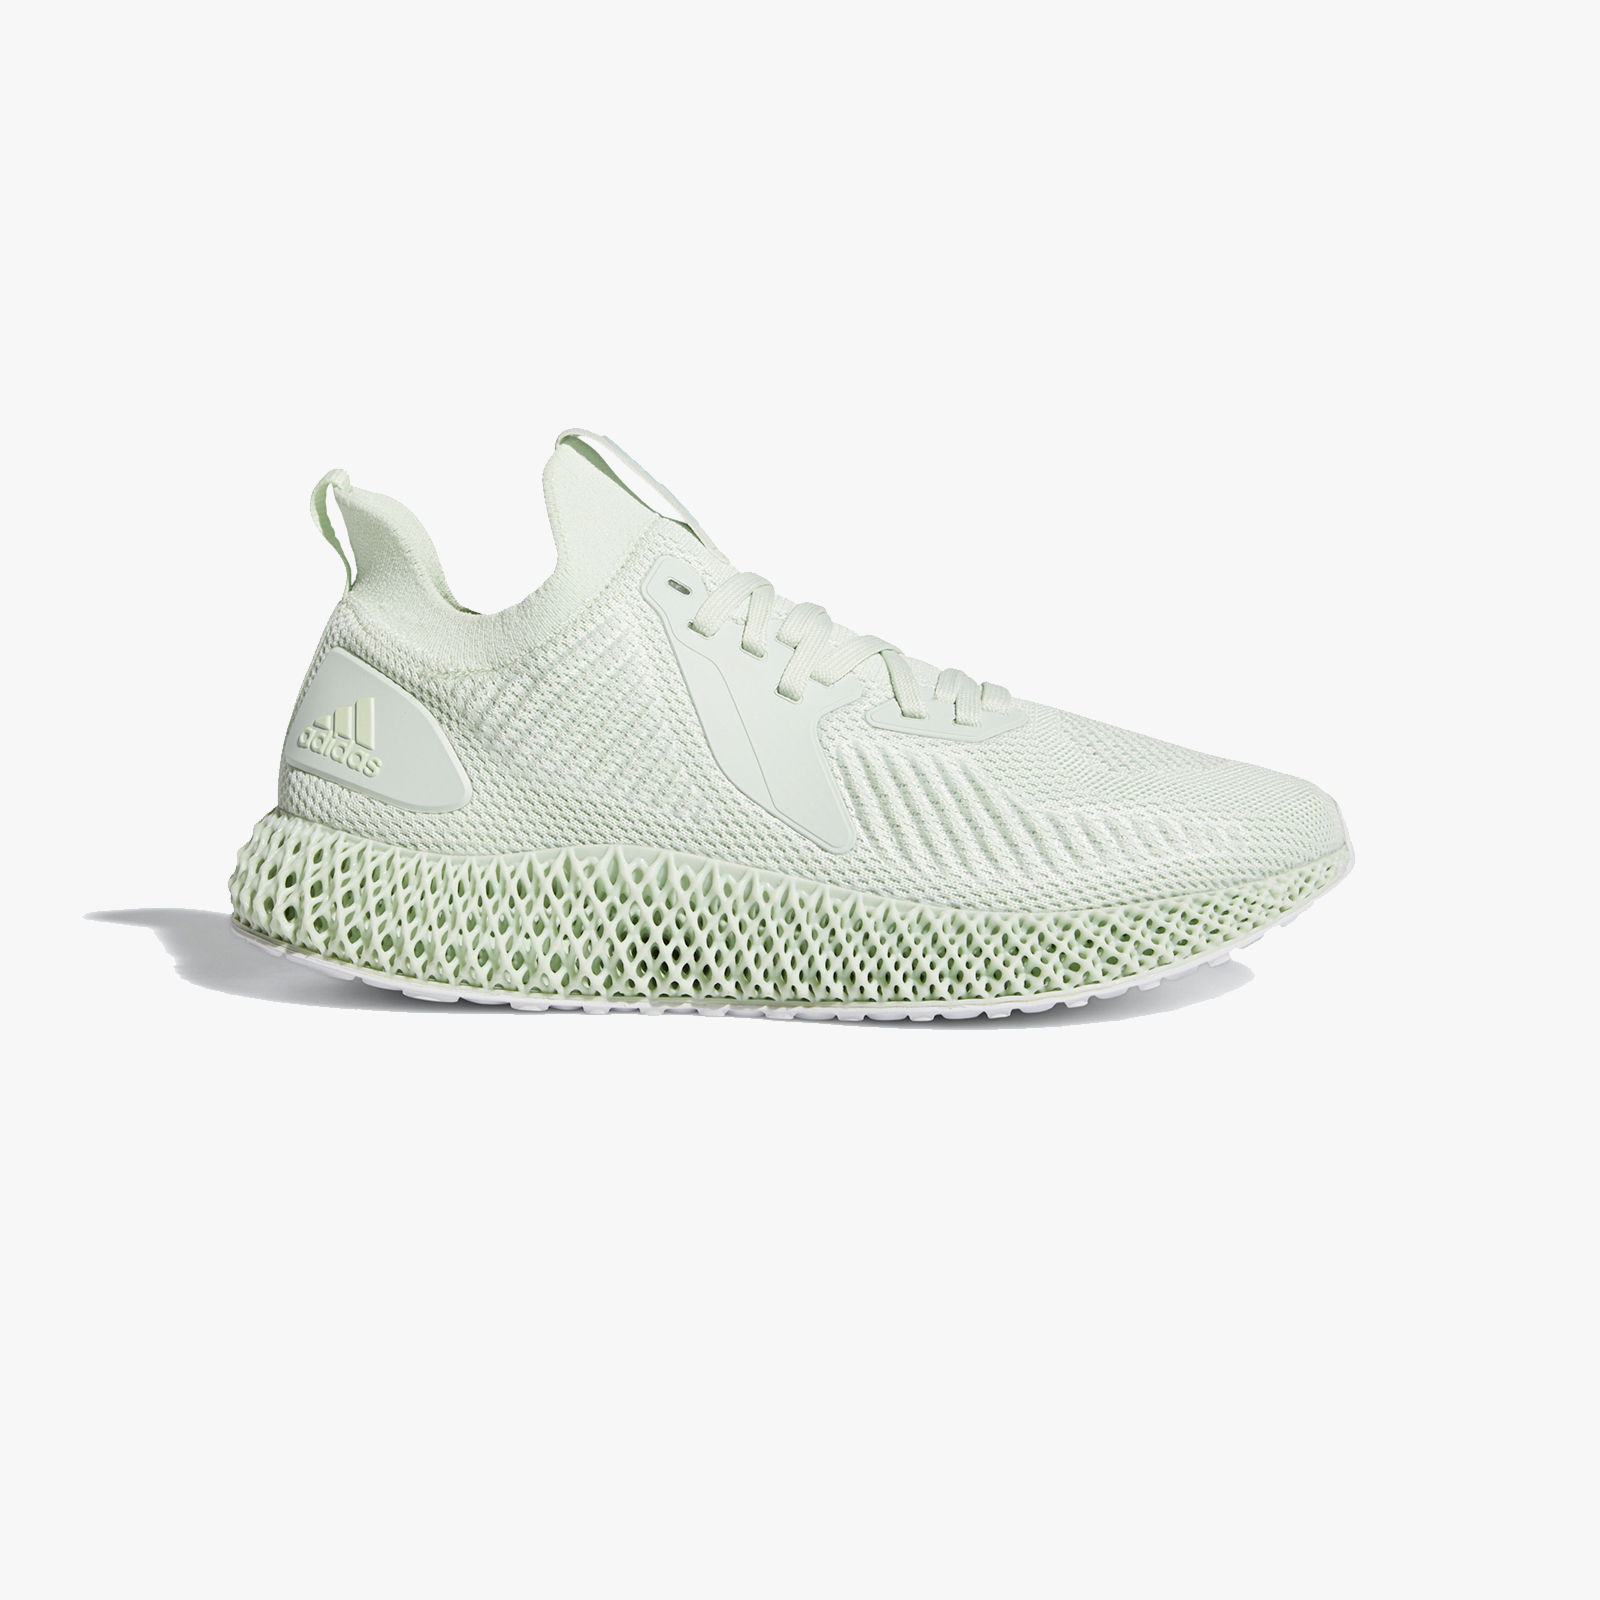 adidas Alphaedge 4D Parley Ee5199 Sneakersnstuff